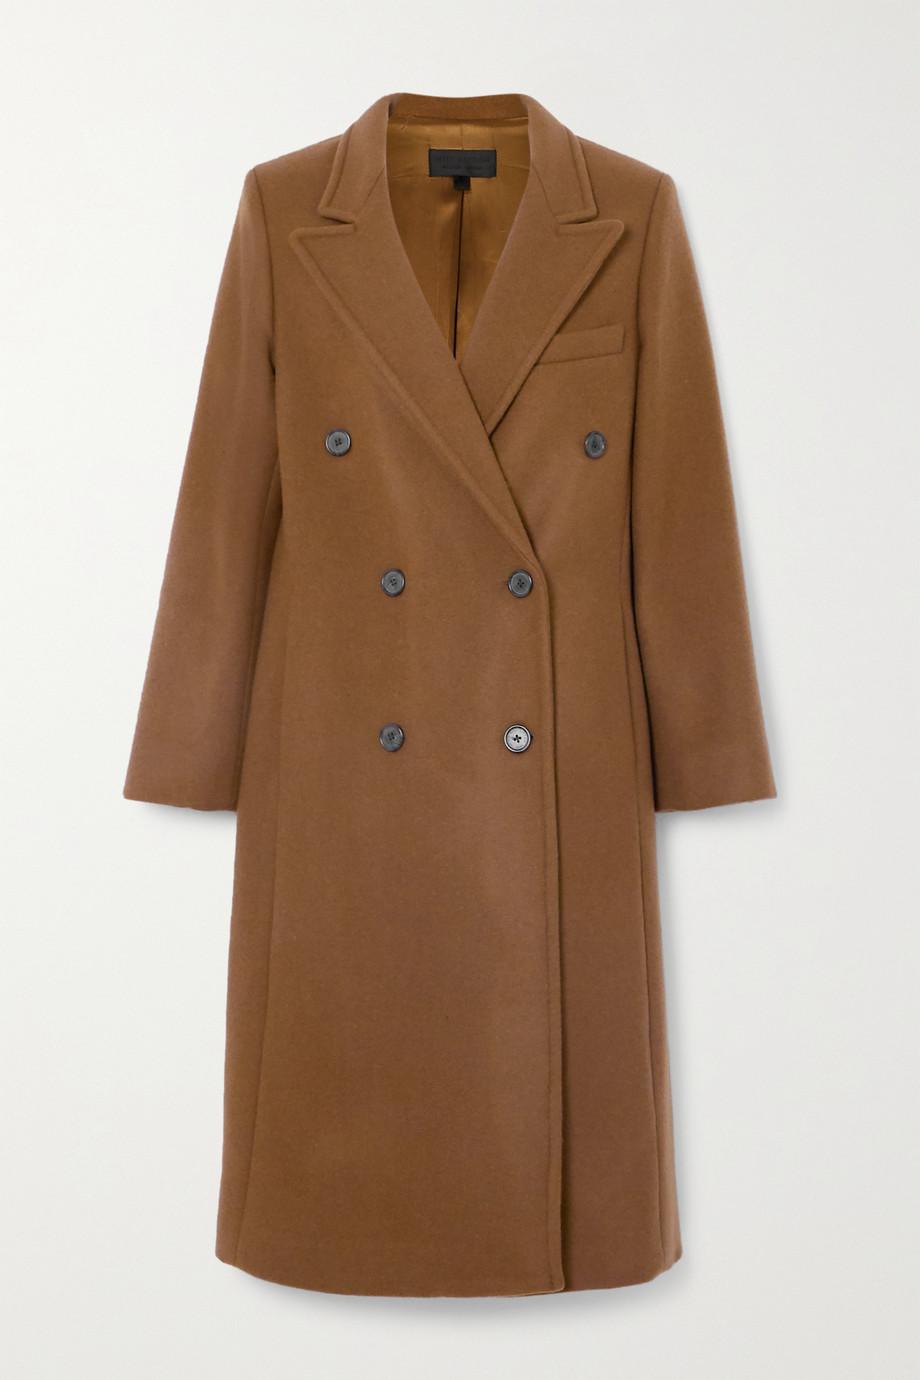 Nili Lotan Matthew doppelreihiger Mantel aus Wolle